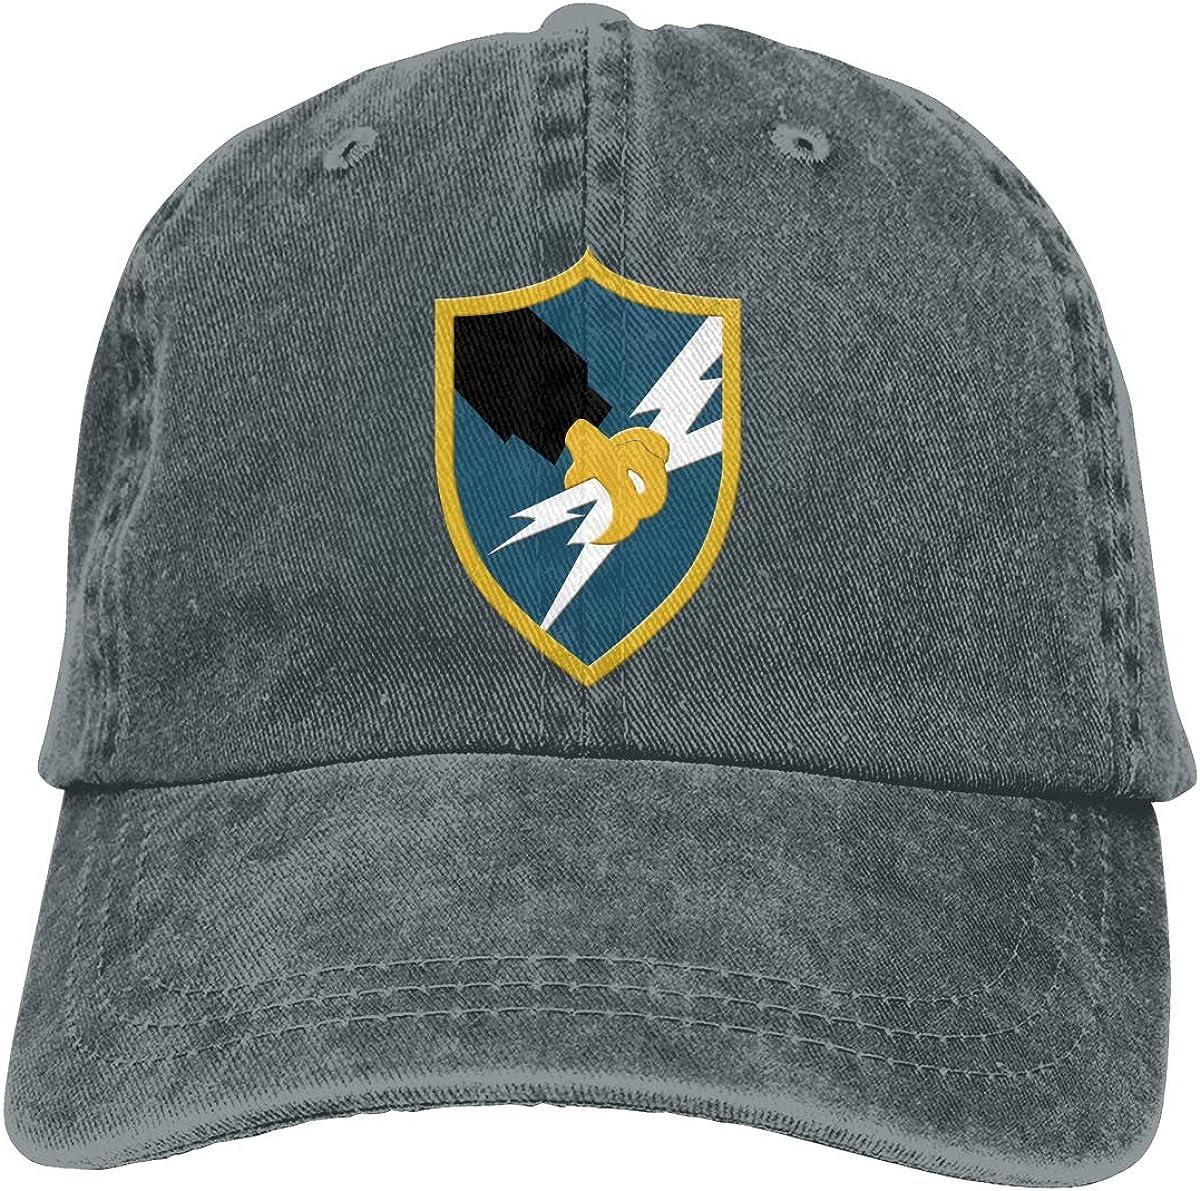 SLISL EIEI US Army Security Agency Adjustable Baseball Caps Denim Hats Cowboy Sport Outdoor